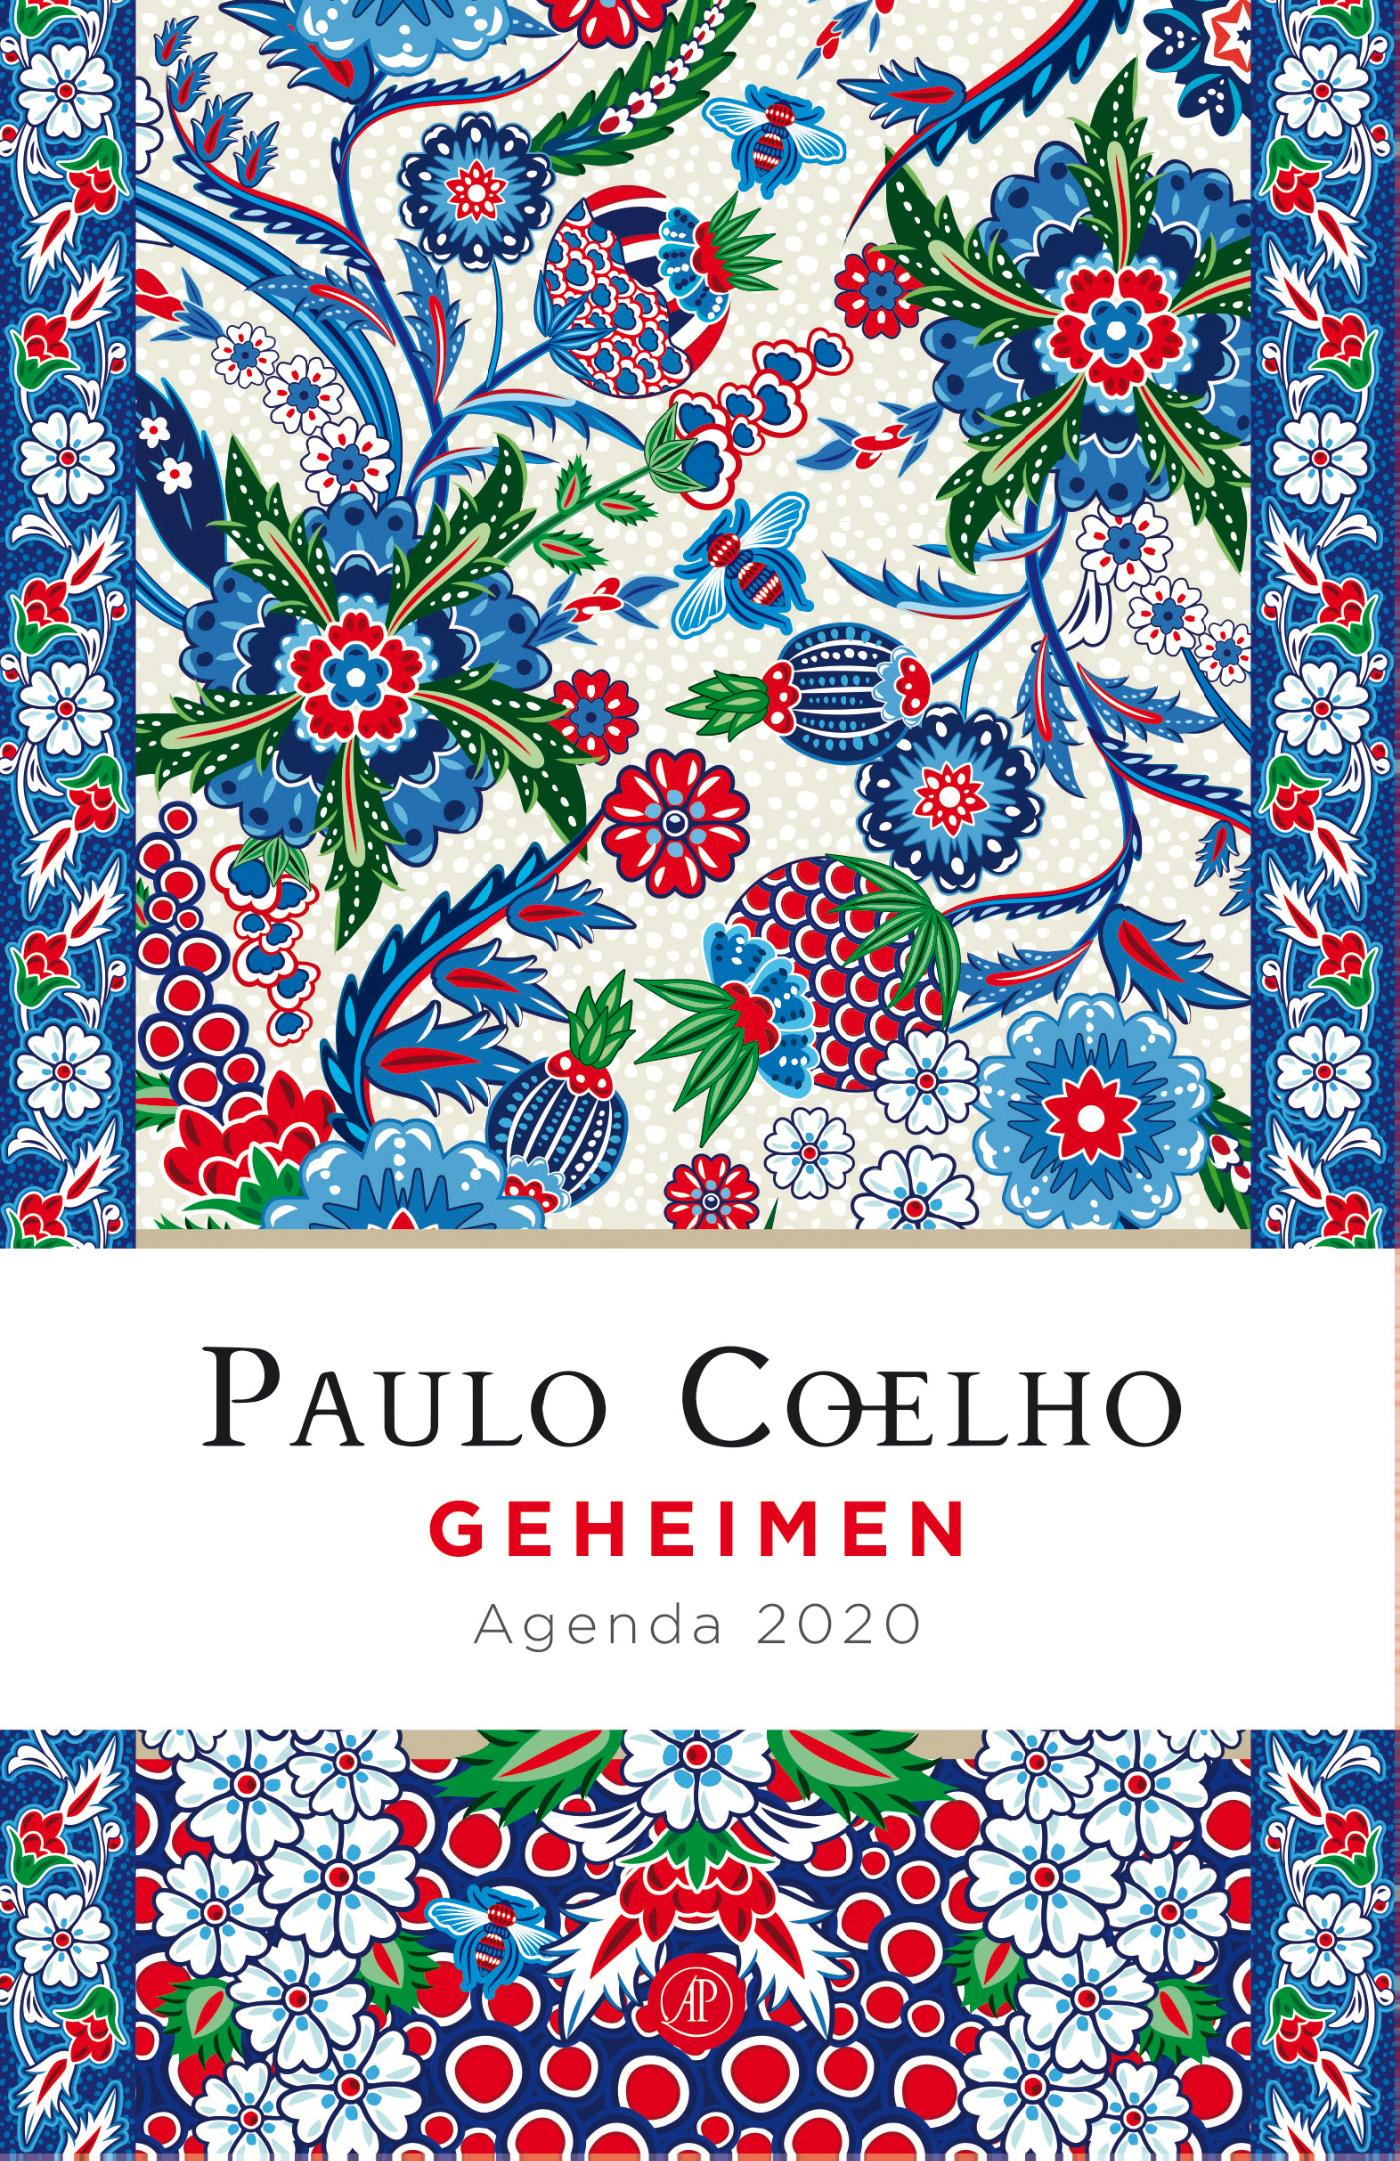 Geheimen - Agenda 2020